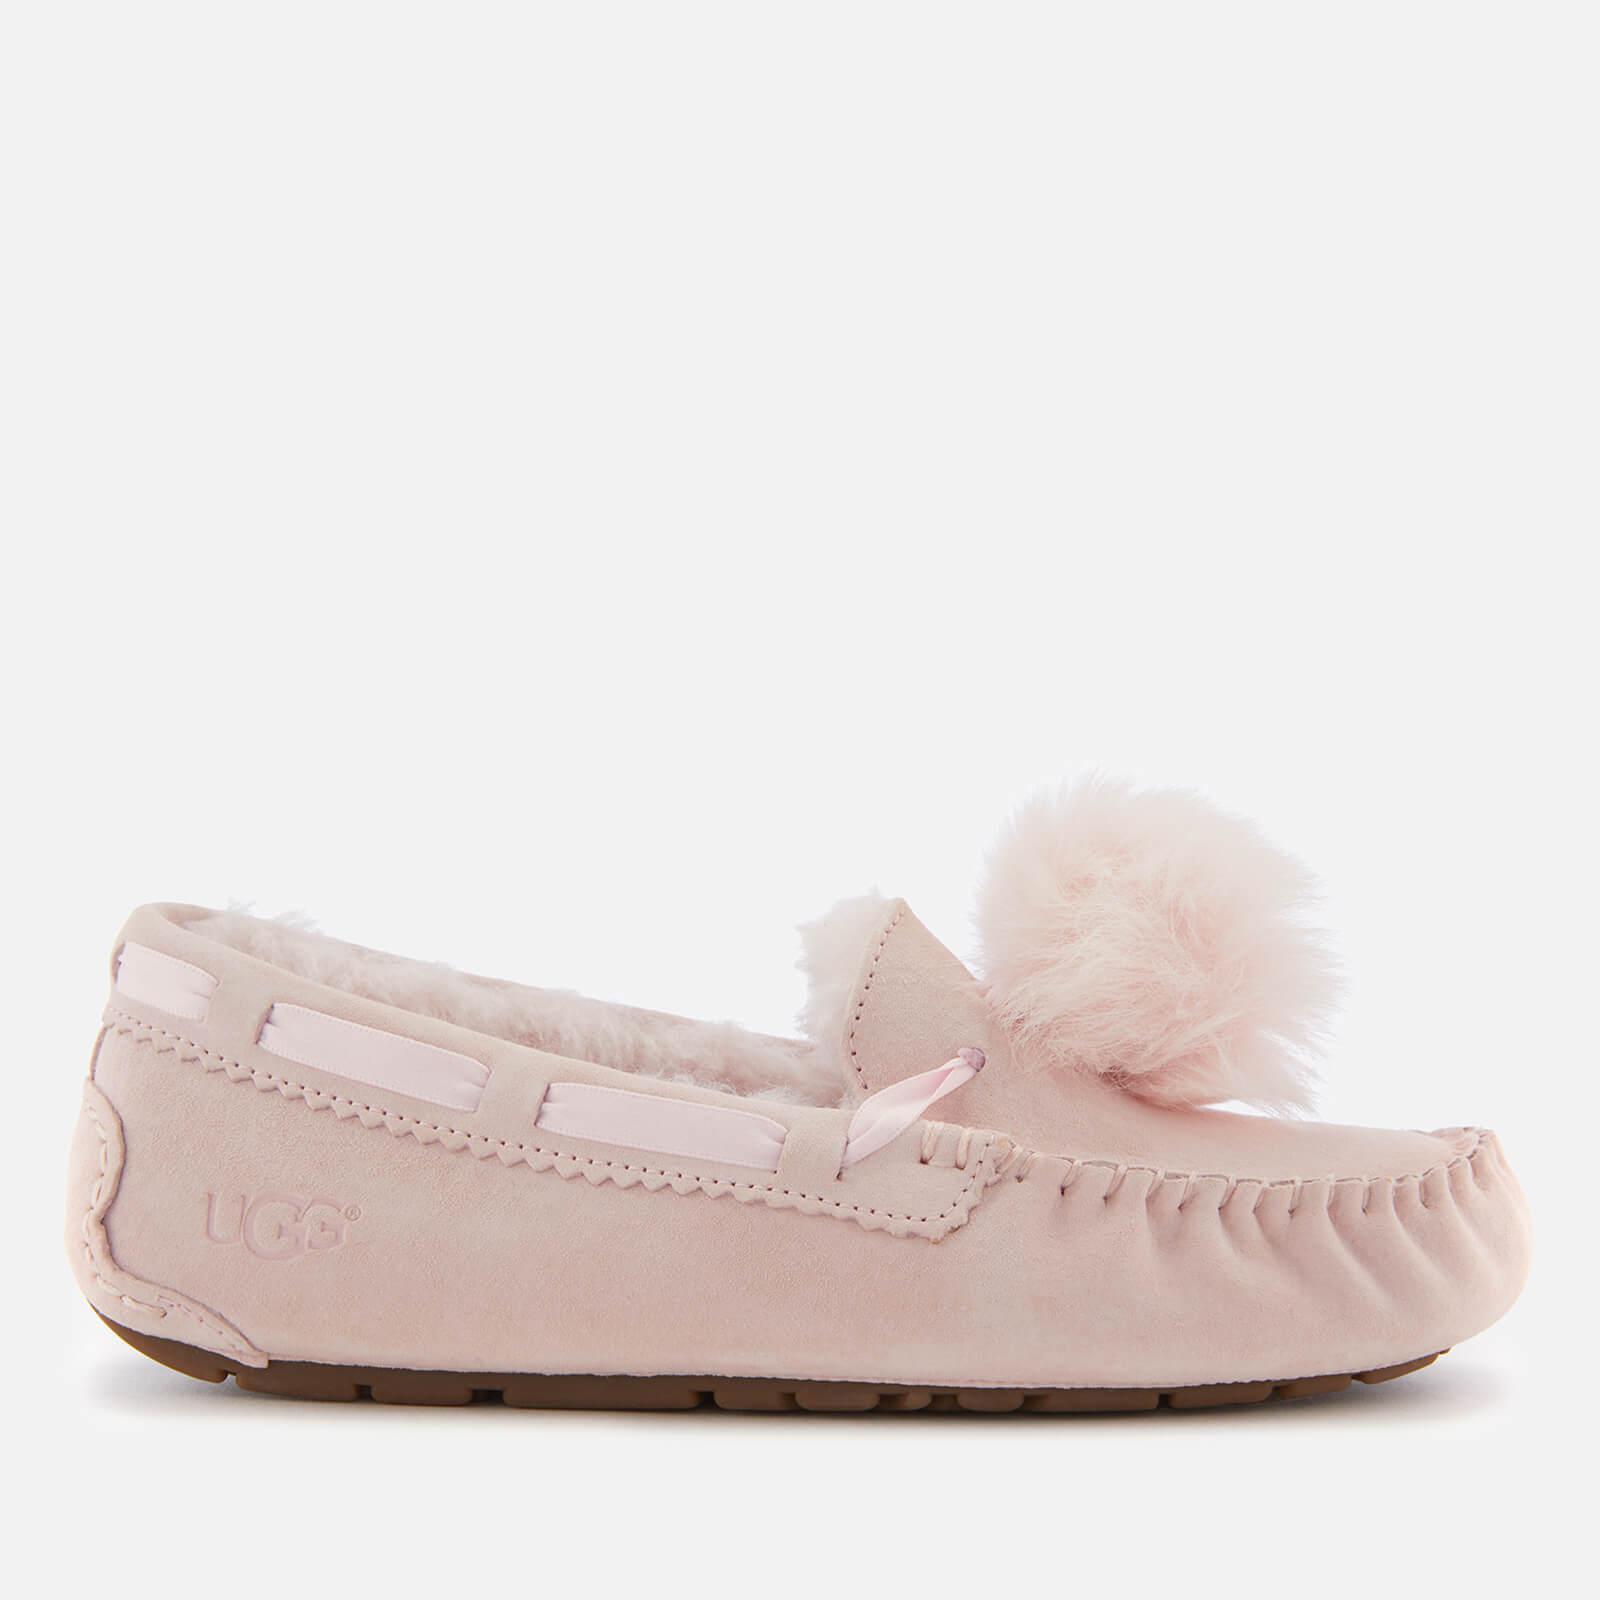 2d4da2624aa Ugg Dakota Moccasin Suede Slippers in Pink - Lyst